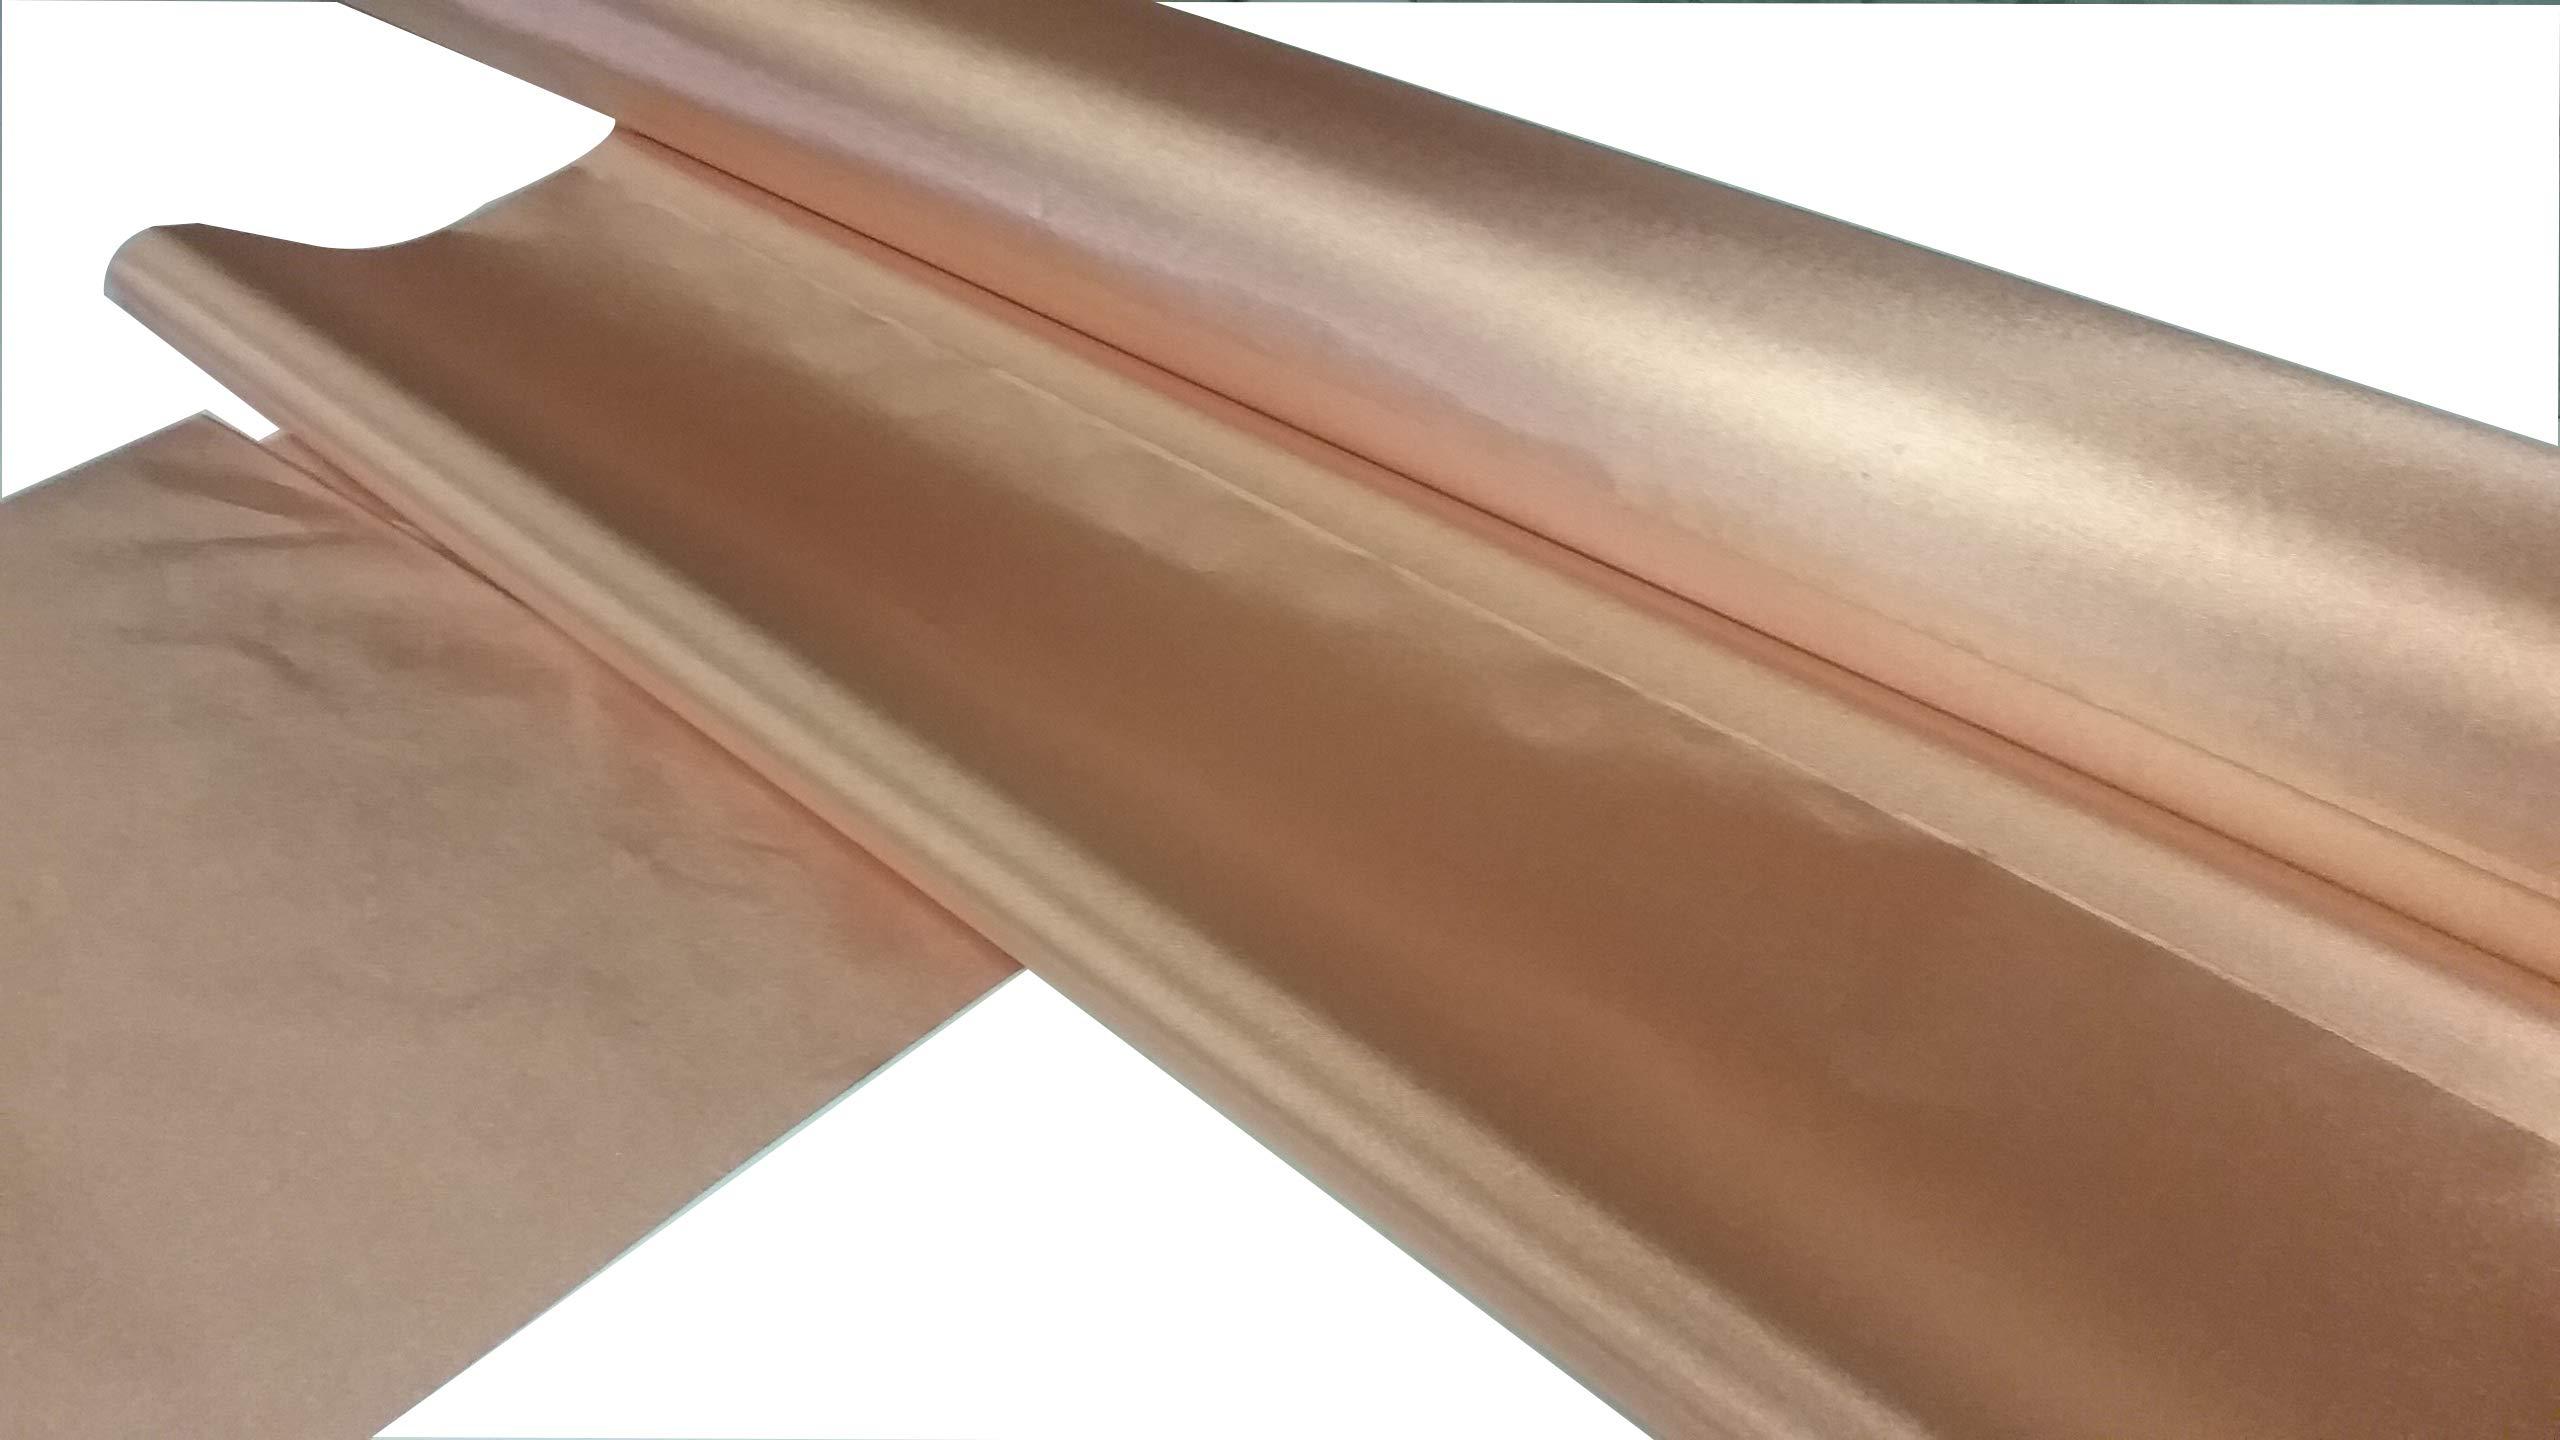 Smart Meter Filter, Cell Signal Blocking, WiFi Blocking Nickel/Copper Fabric. (3 Linear feet)